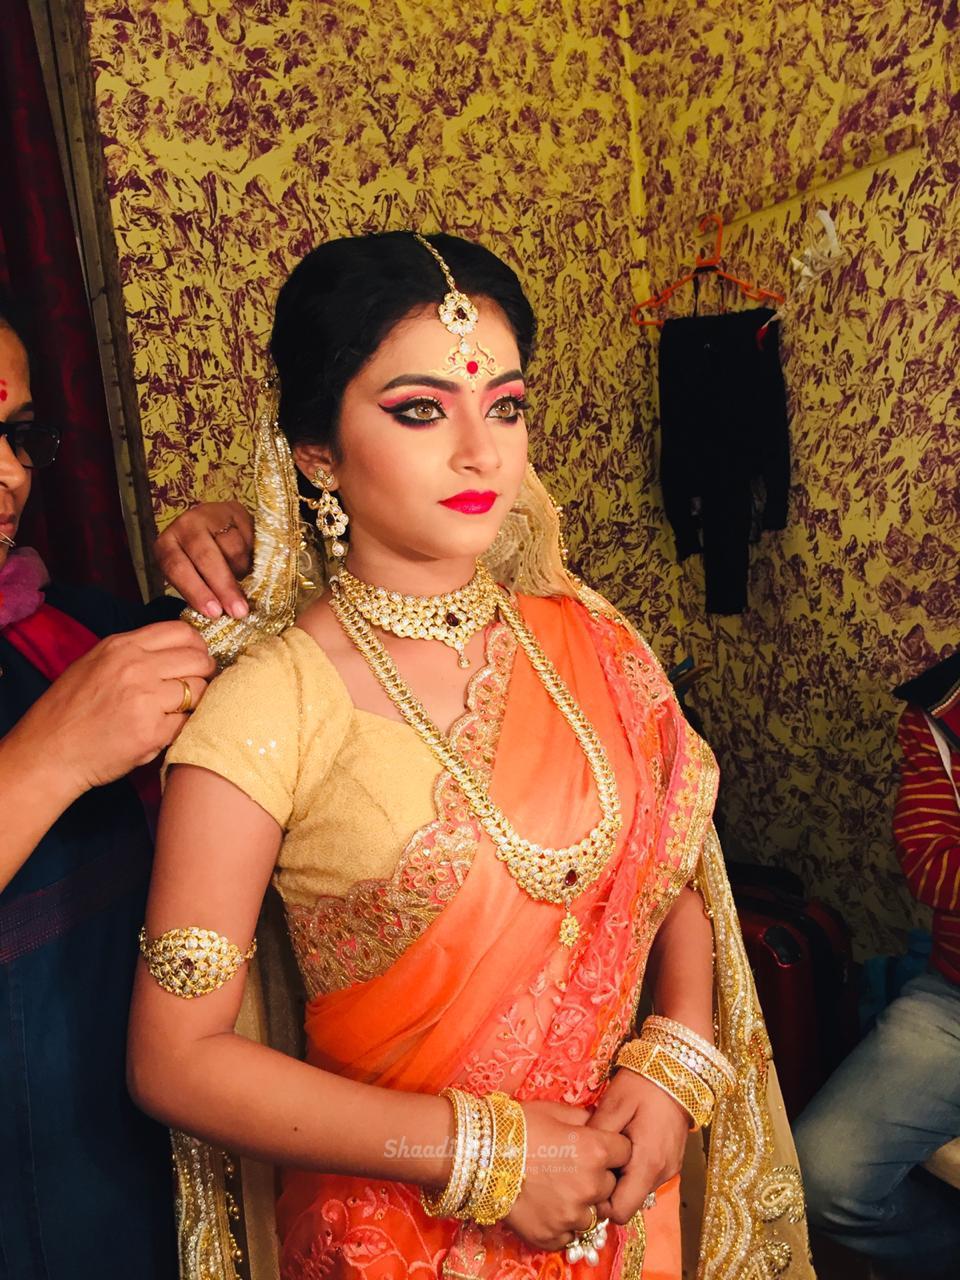 Pankaj Makeup Academy